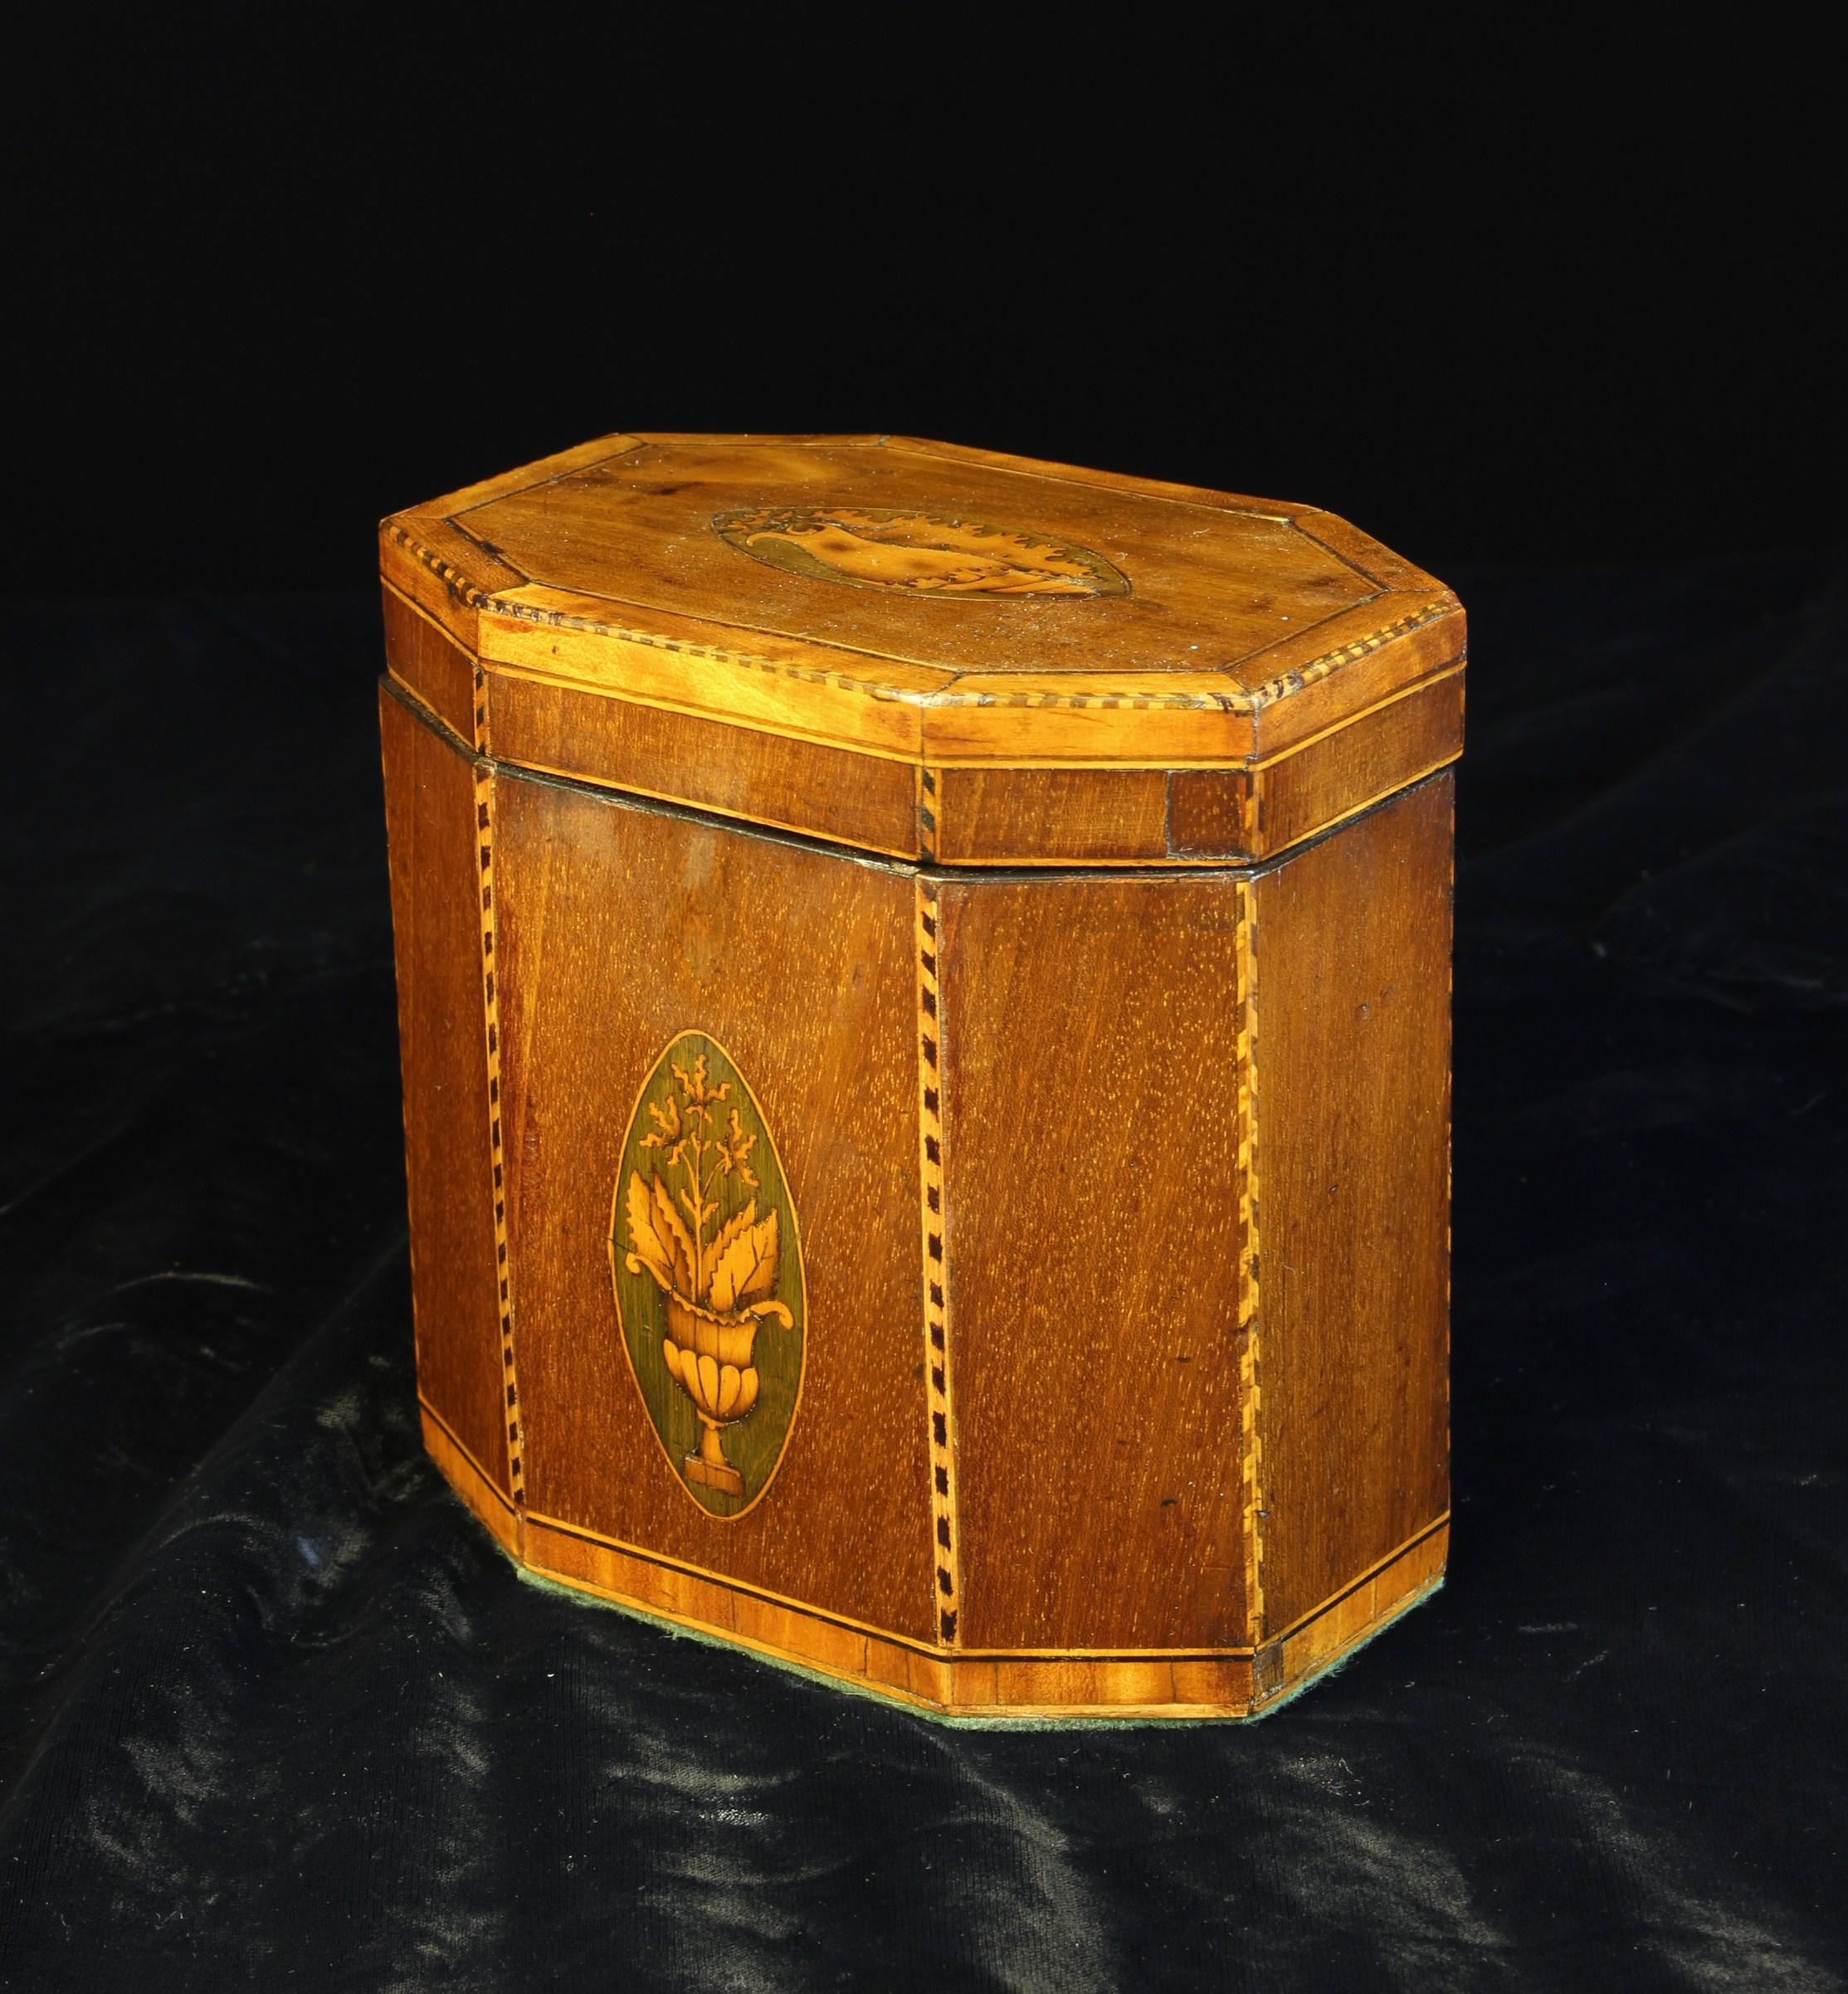 A George III Mahogany & Satinwood-banded Tea Caddy of octagonal form.